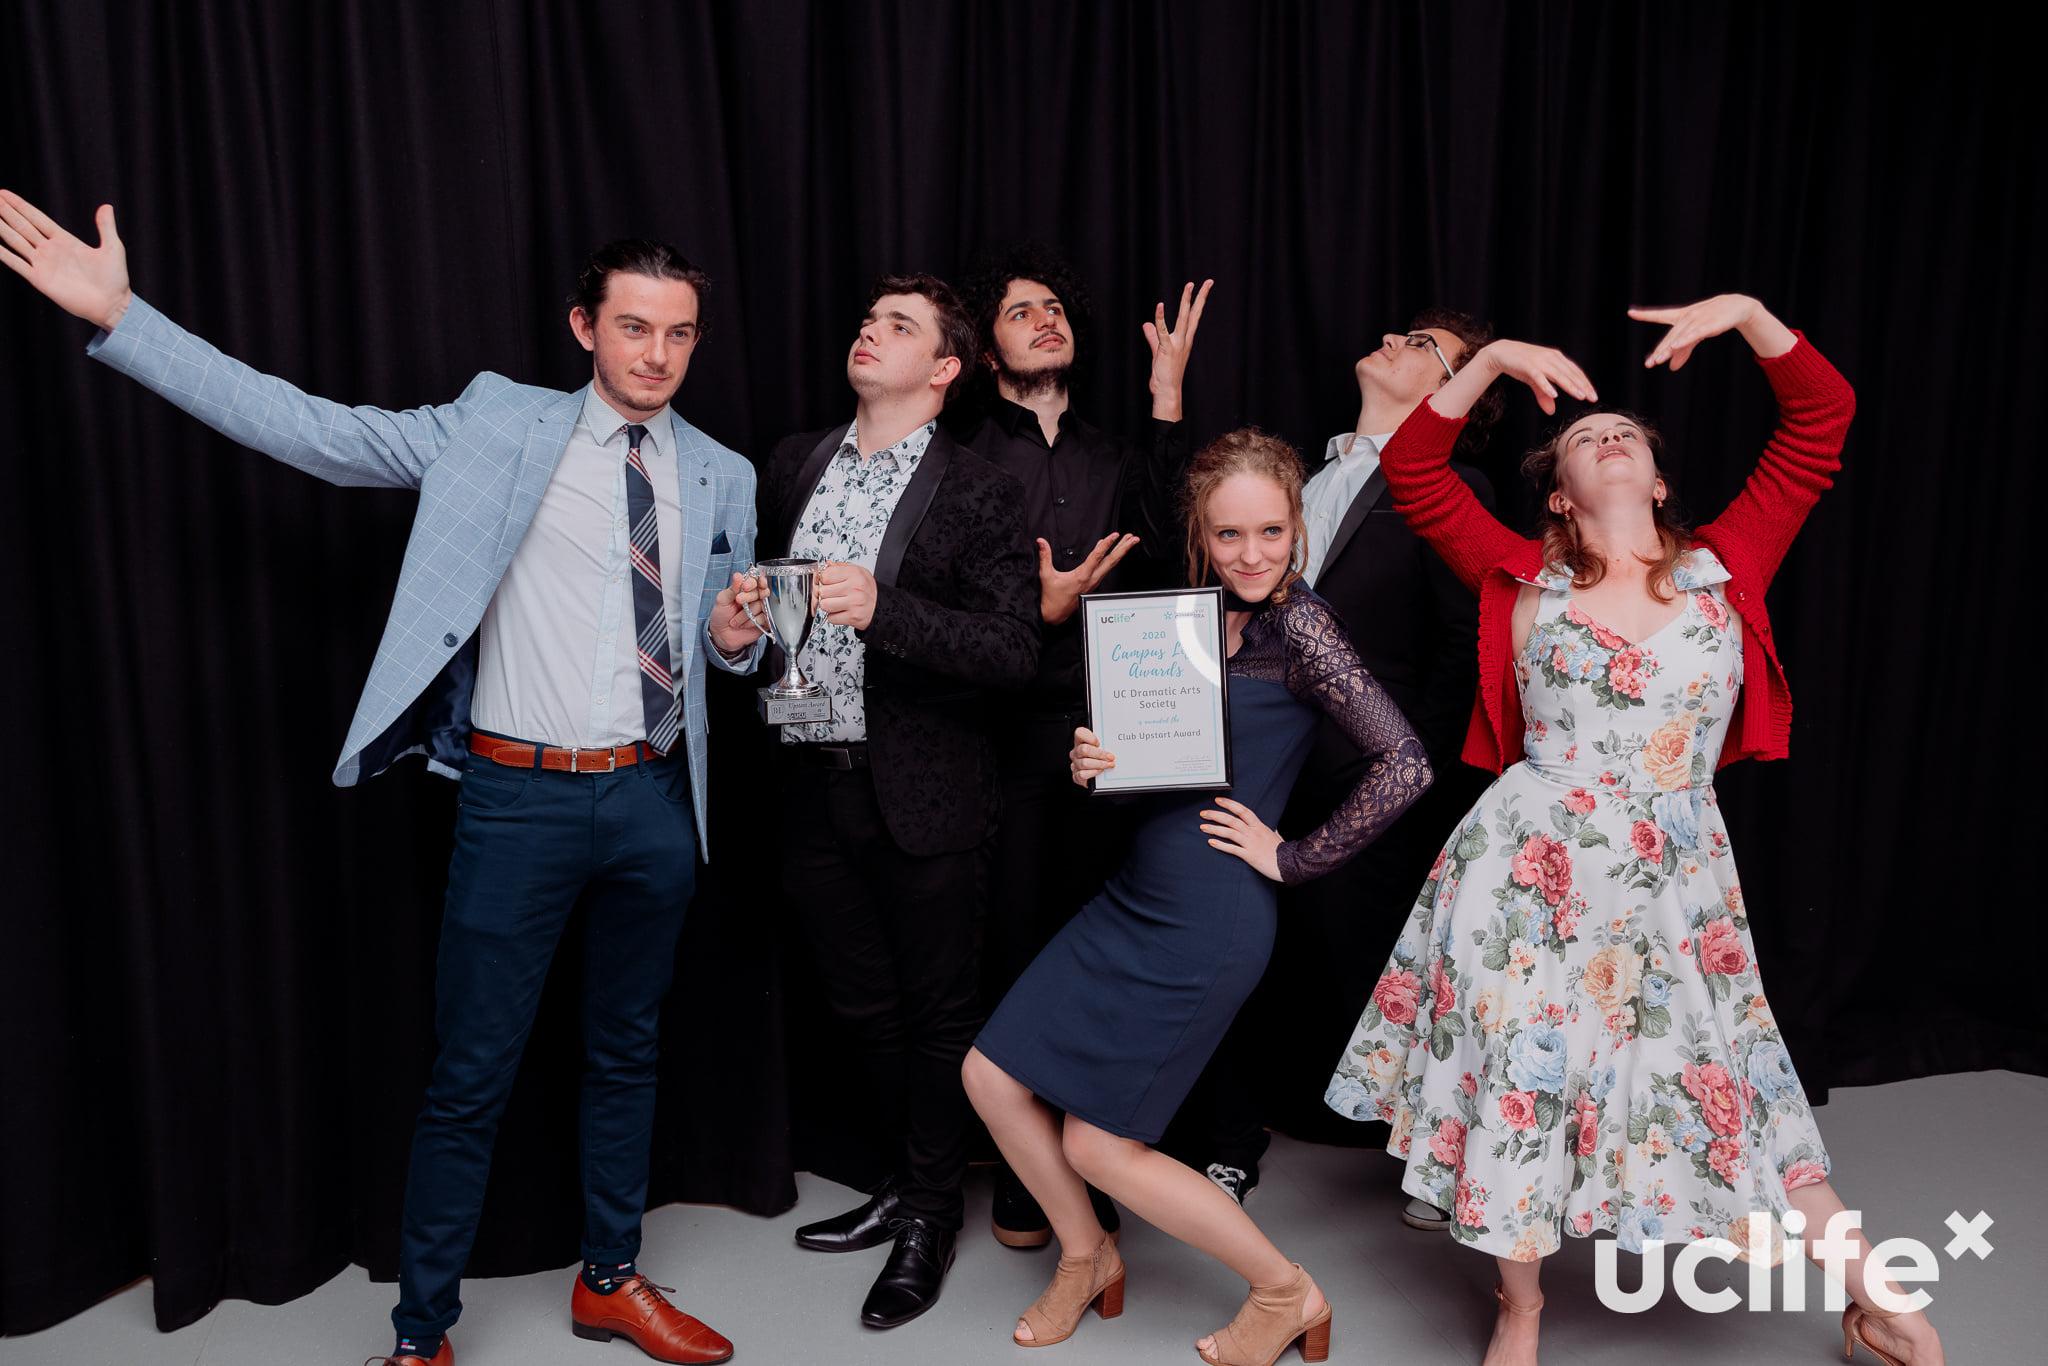 UC Drama club members at the UCLife awards